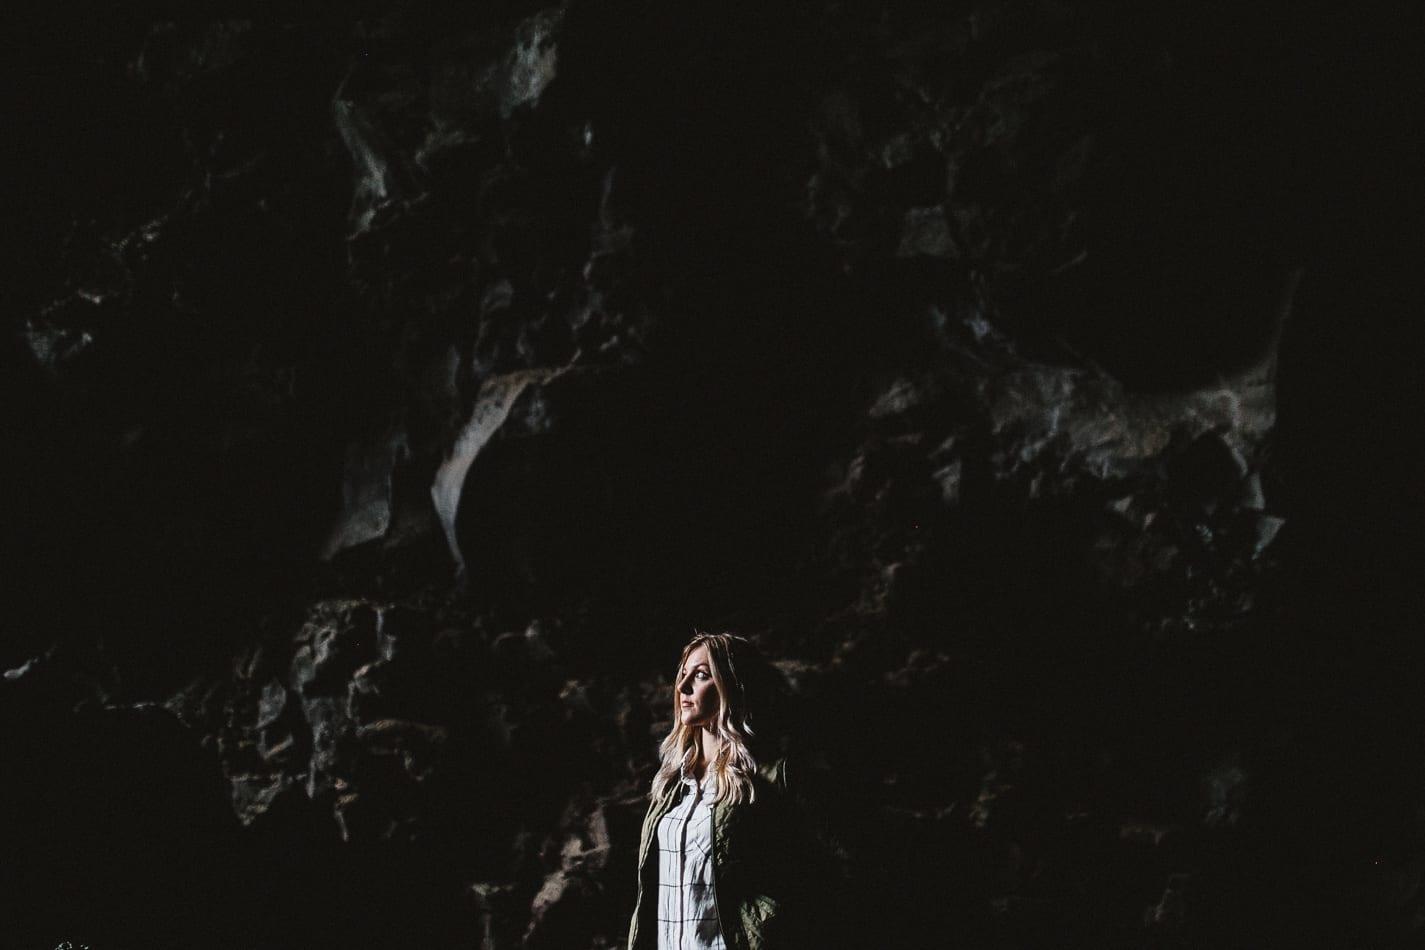 pluto-cave-mount-shasta-lifestyle-portrati-photo-26